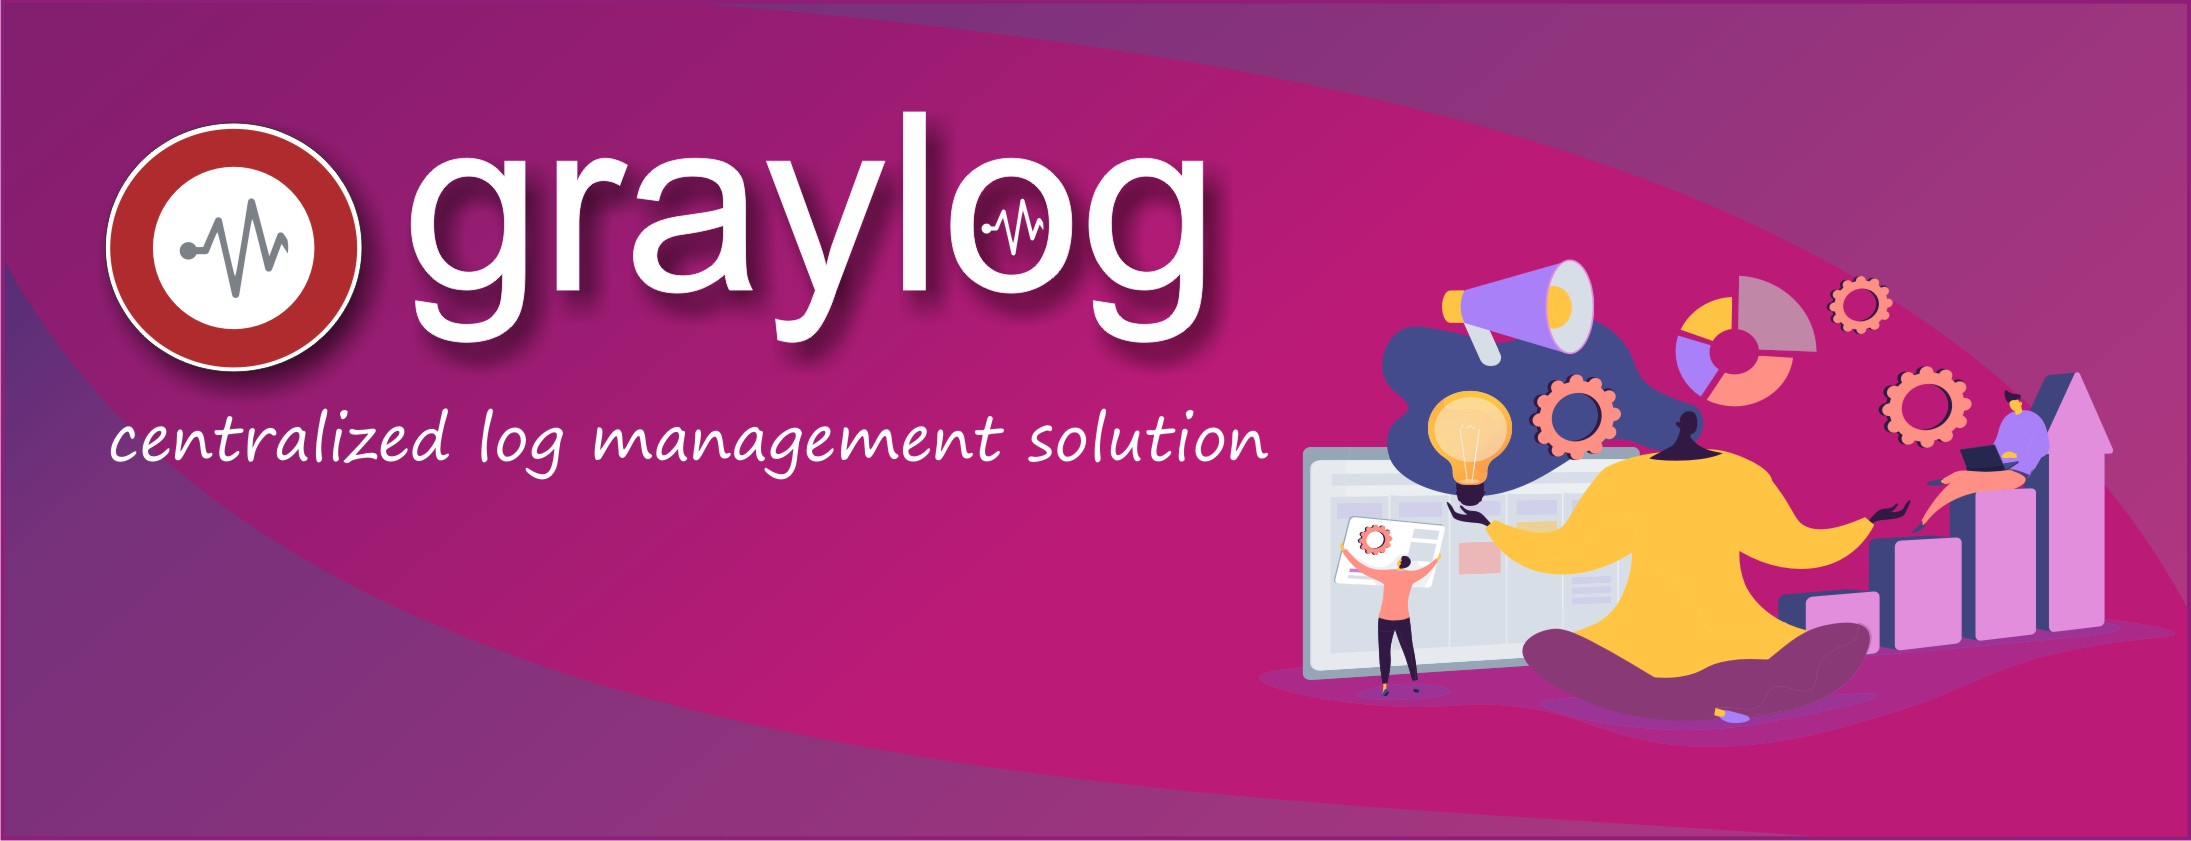 graylog-management